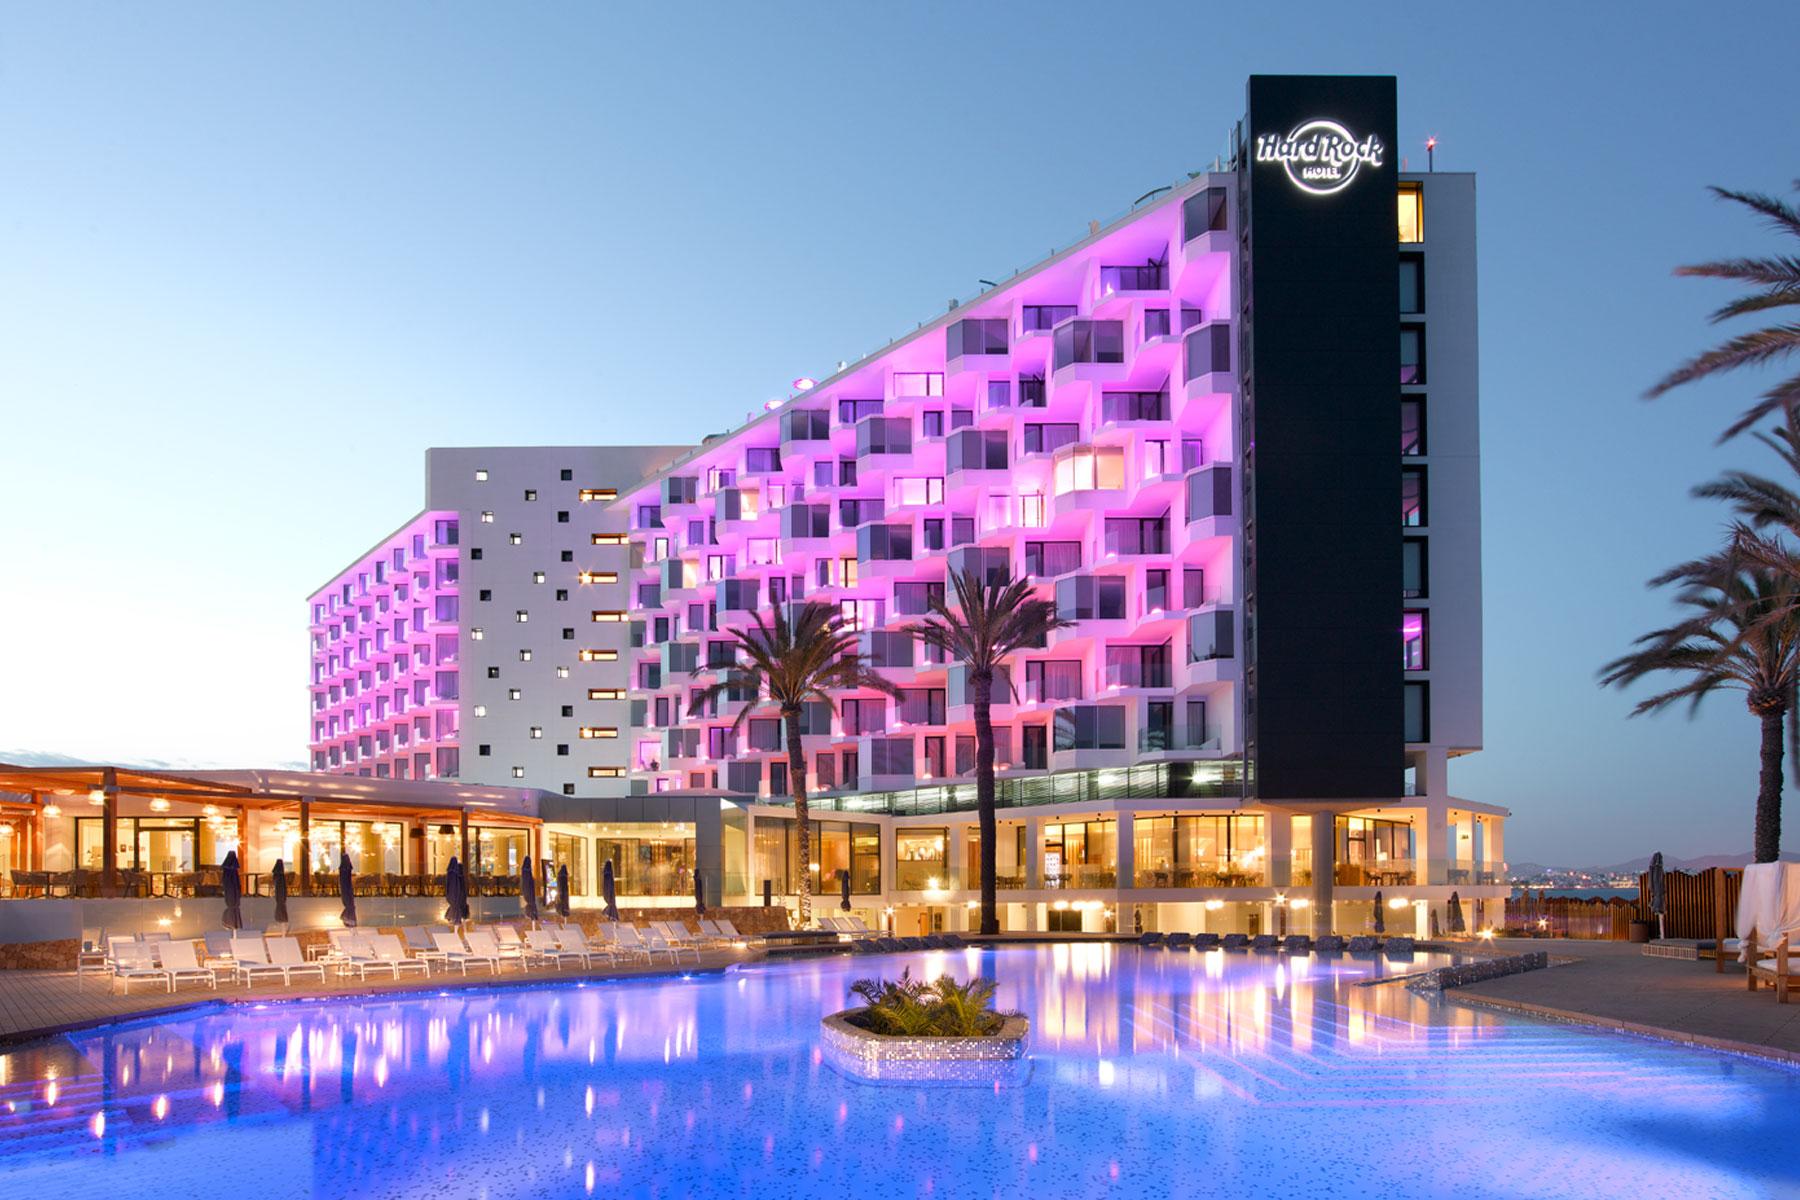 Hard Rock Resort Ibiza, Robot new's project